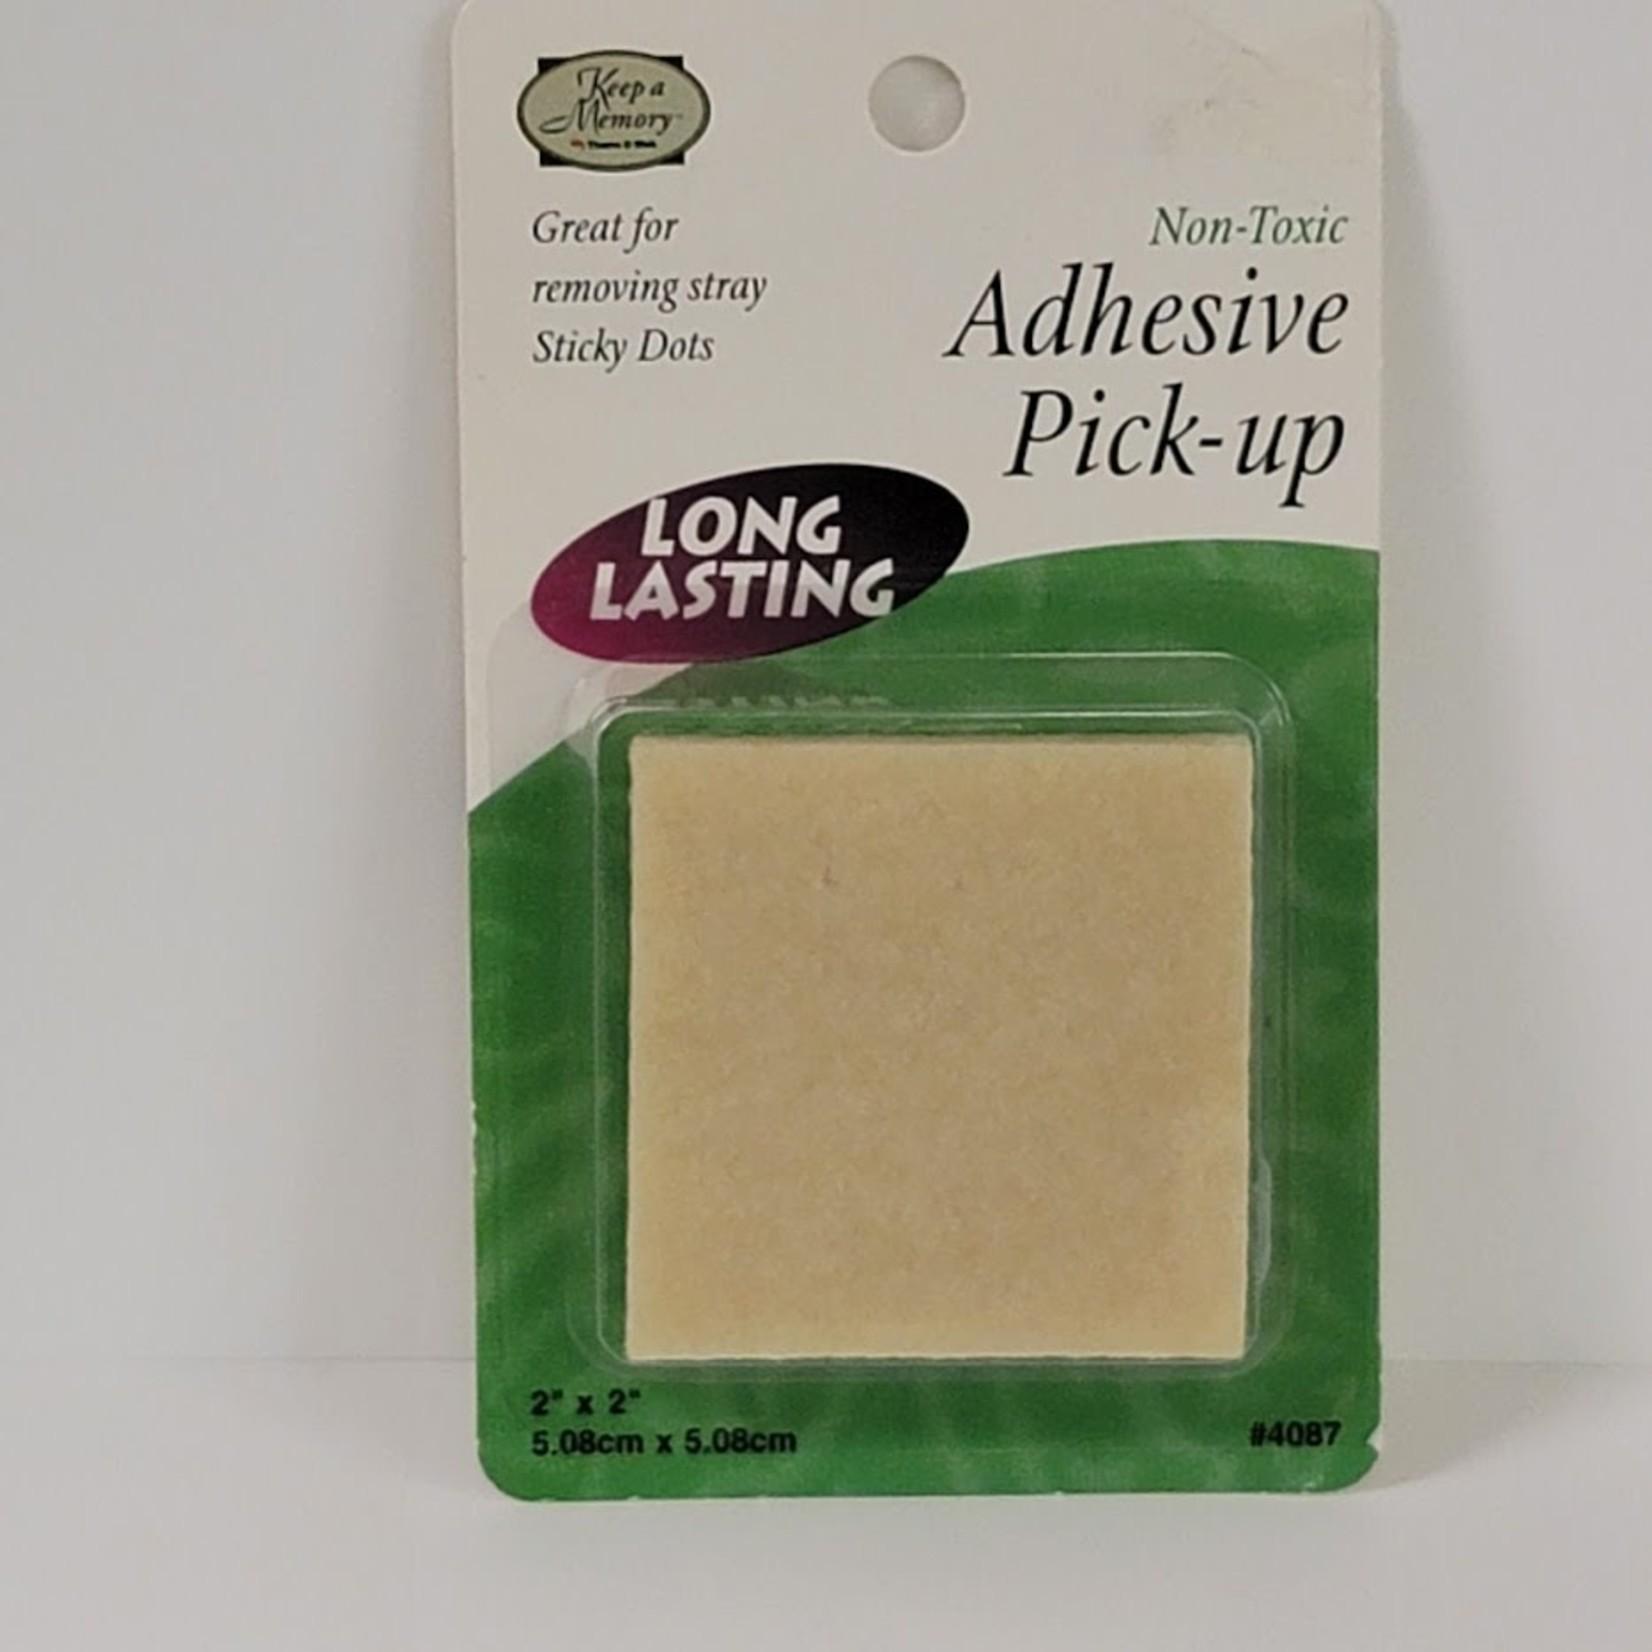 Adhesive Pick-up